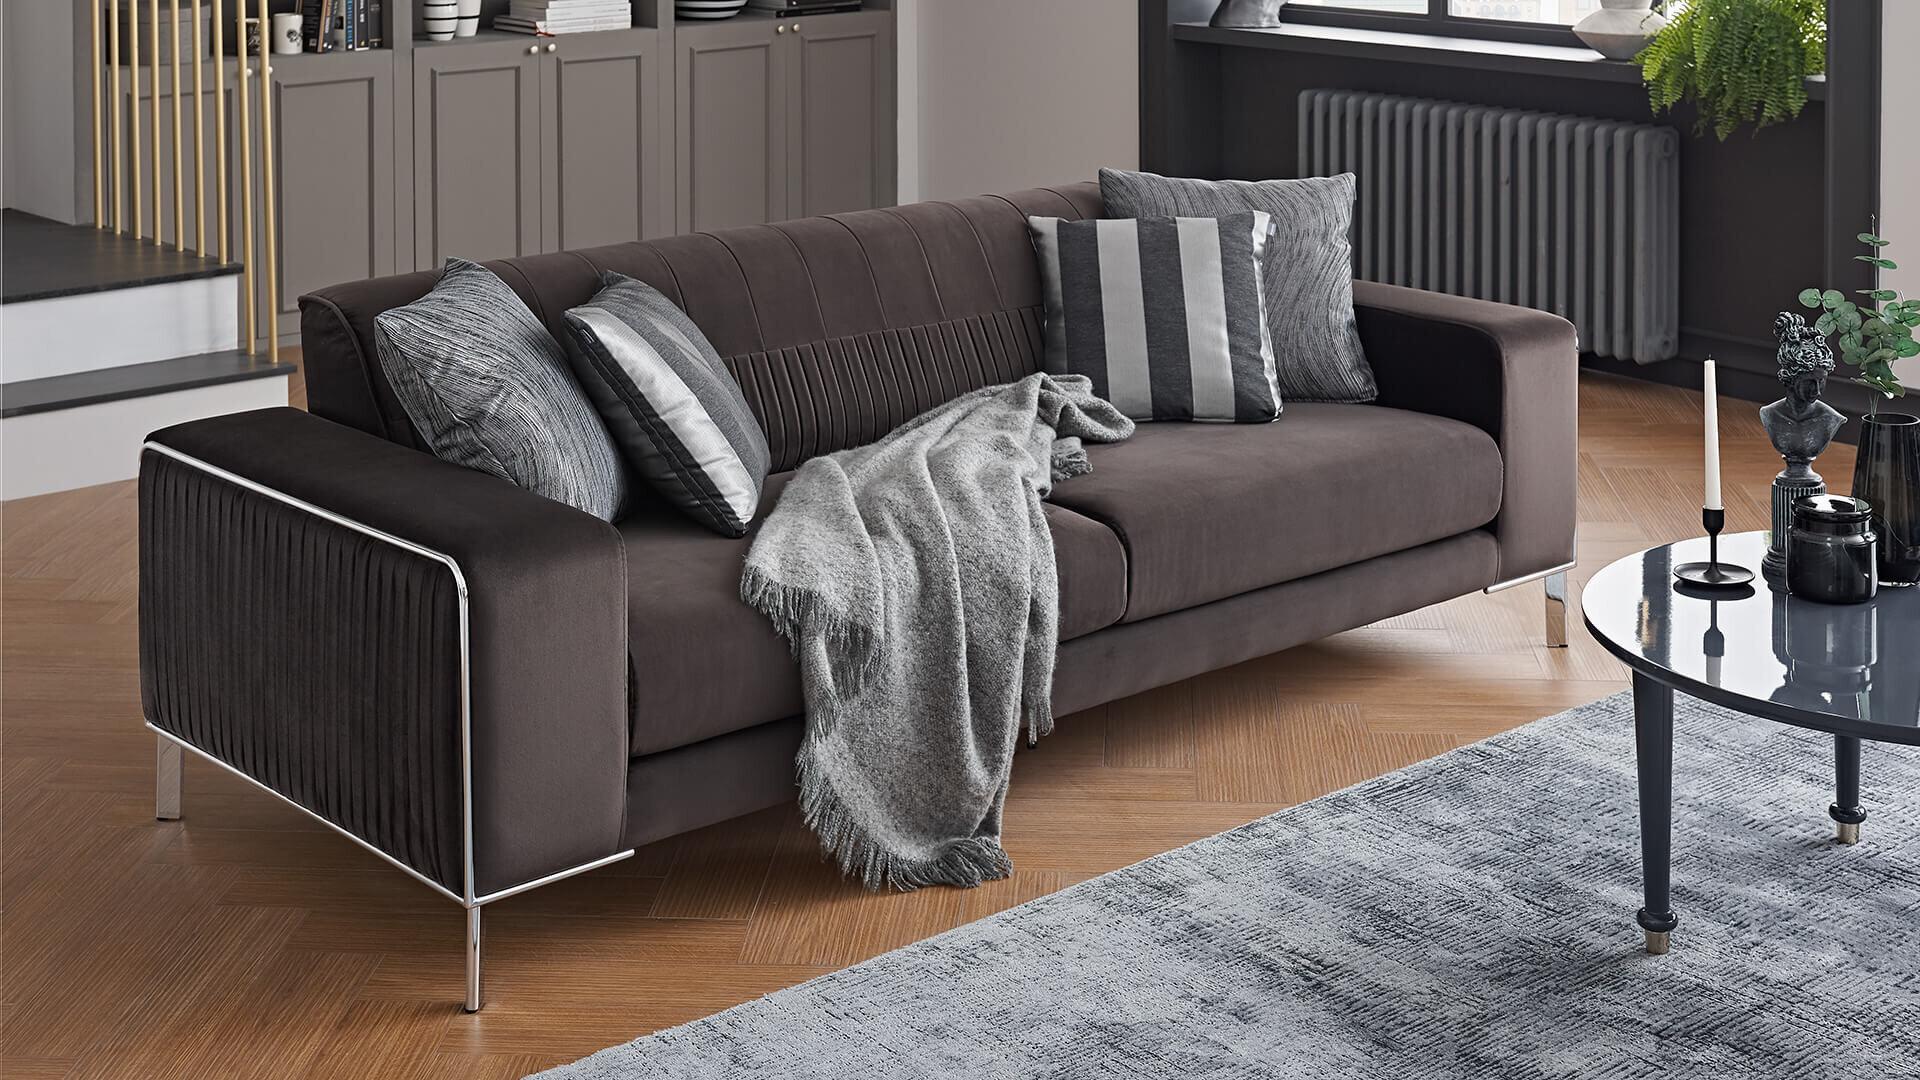 Adel Three Seater Sleeper Sofa